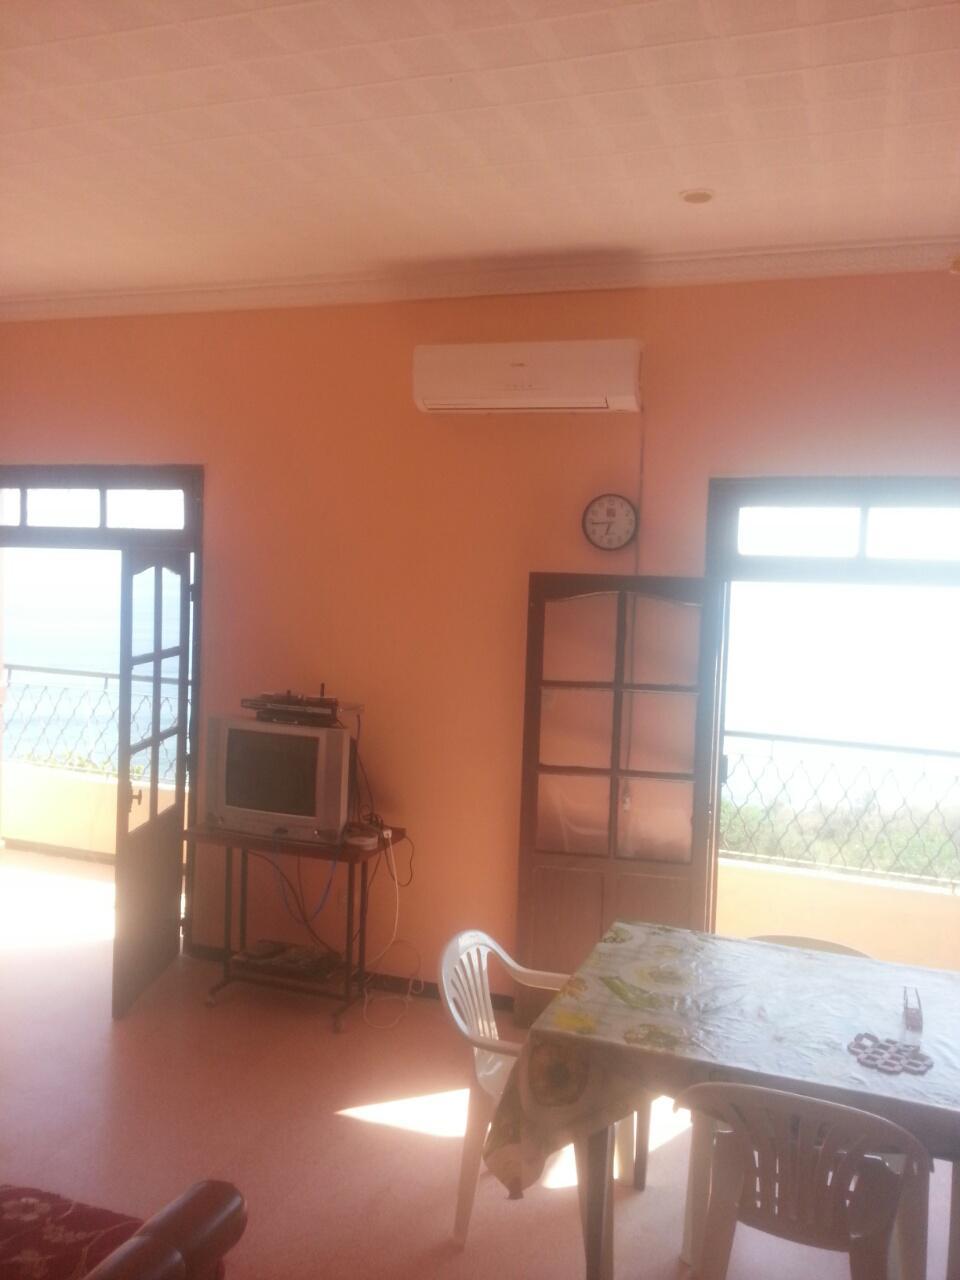 Location Saisonni Re Appartement B Jaia B Jaia Alg Rie